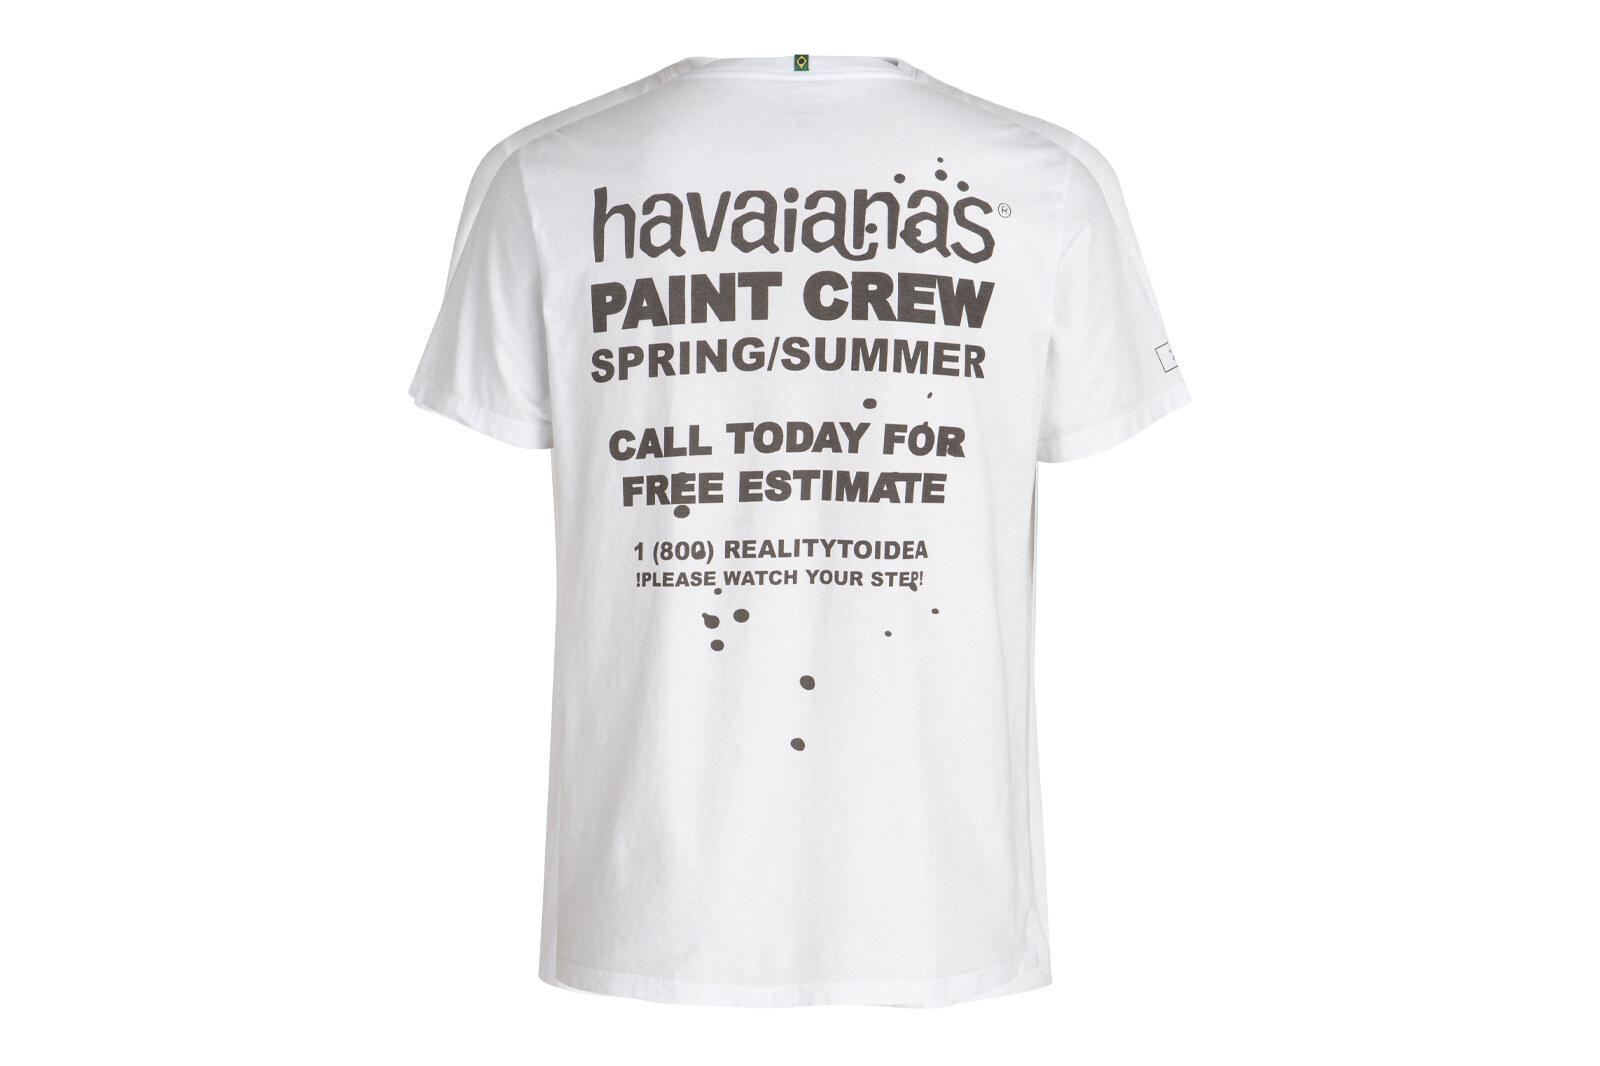 Havaianas x Reality to Idea Joshua Vides Capsule collection